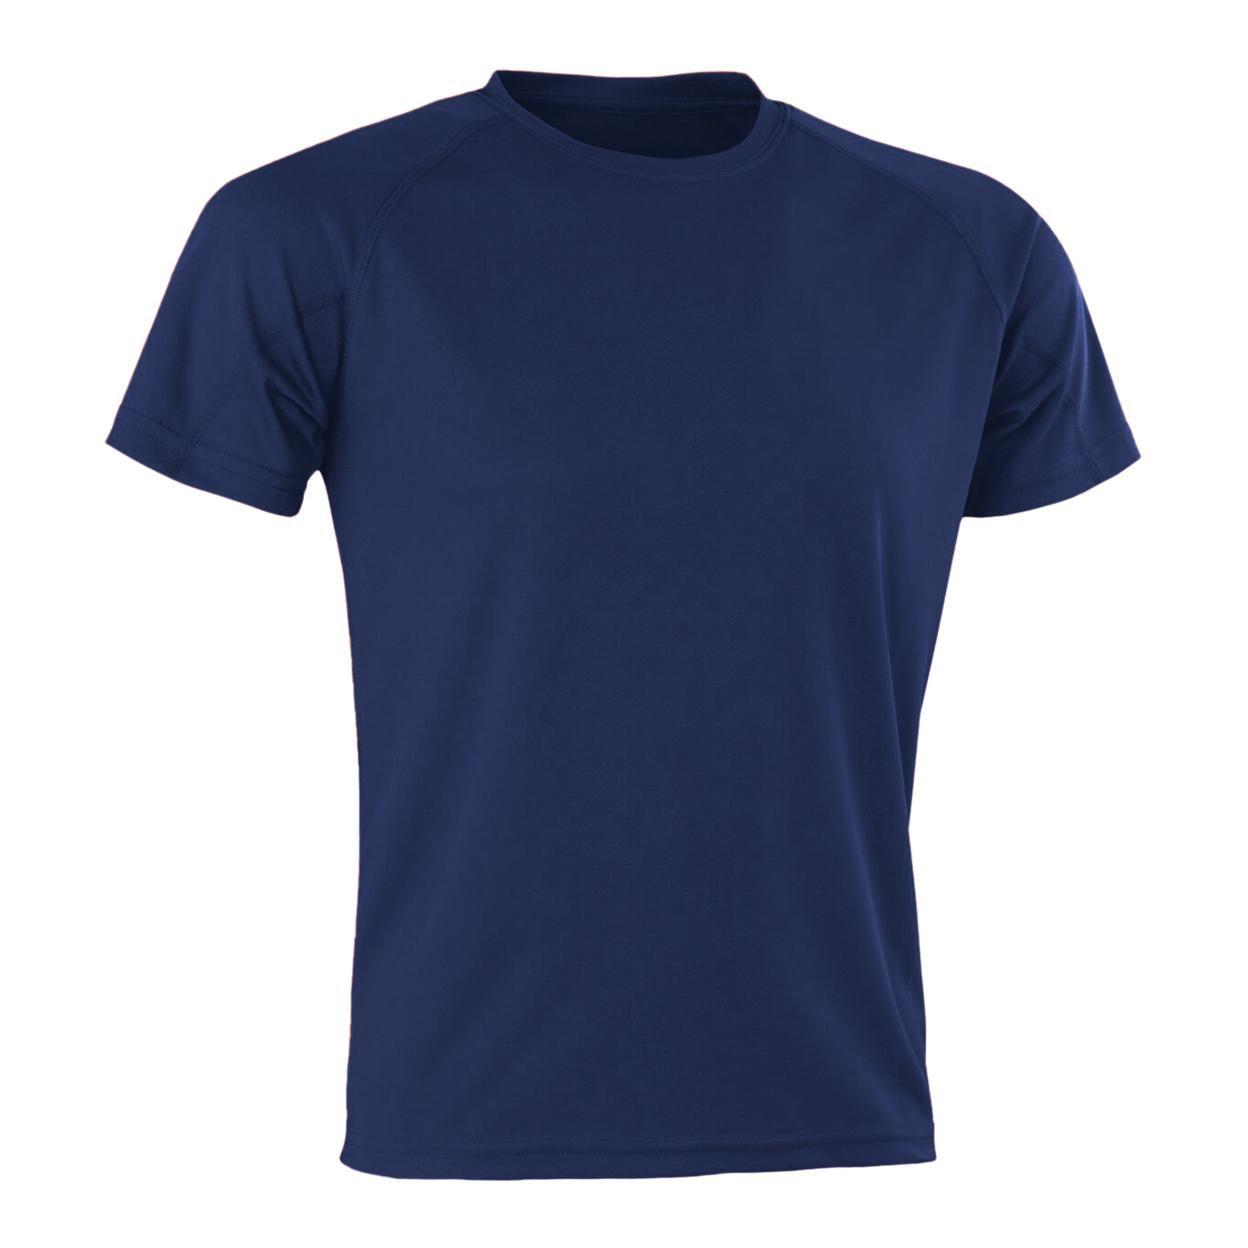 Spiro Mens Aircool T-Shirt Size 5XL